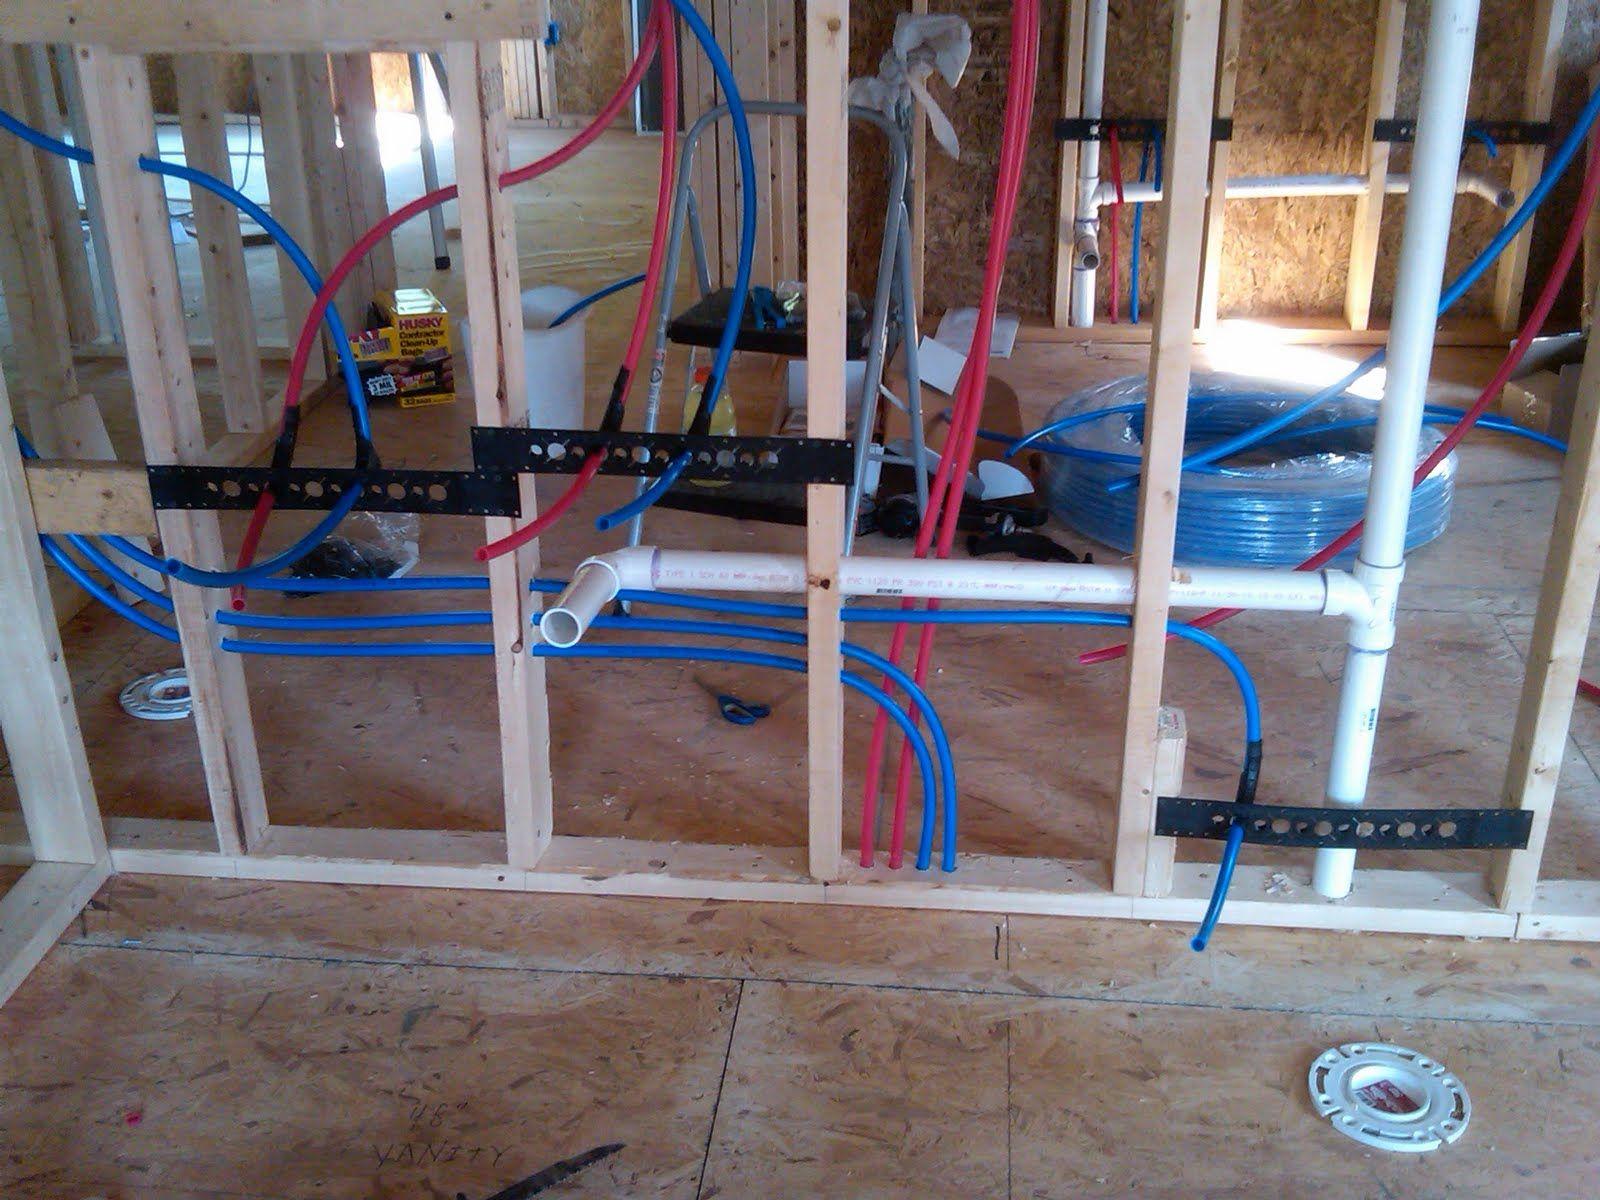 plumbing pex water lines install for toilet  sinks